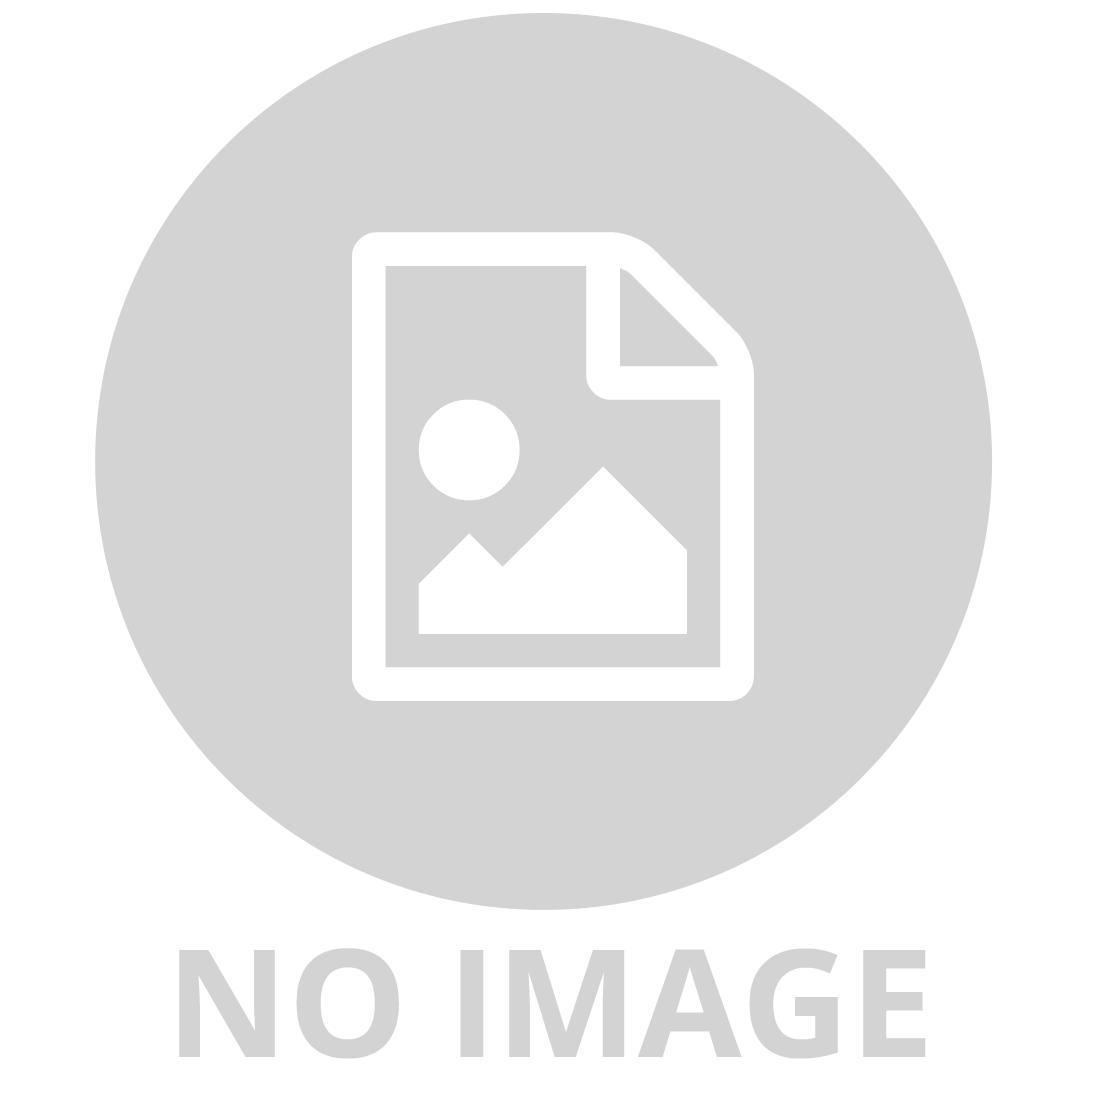 SURE LOX 500PC JIGSAW PUZZLE ALPINE VISTAS DISCOVERING NATURE